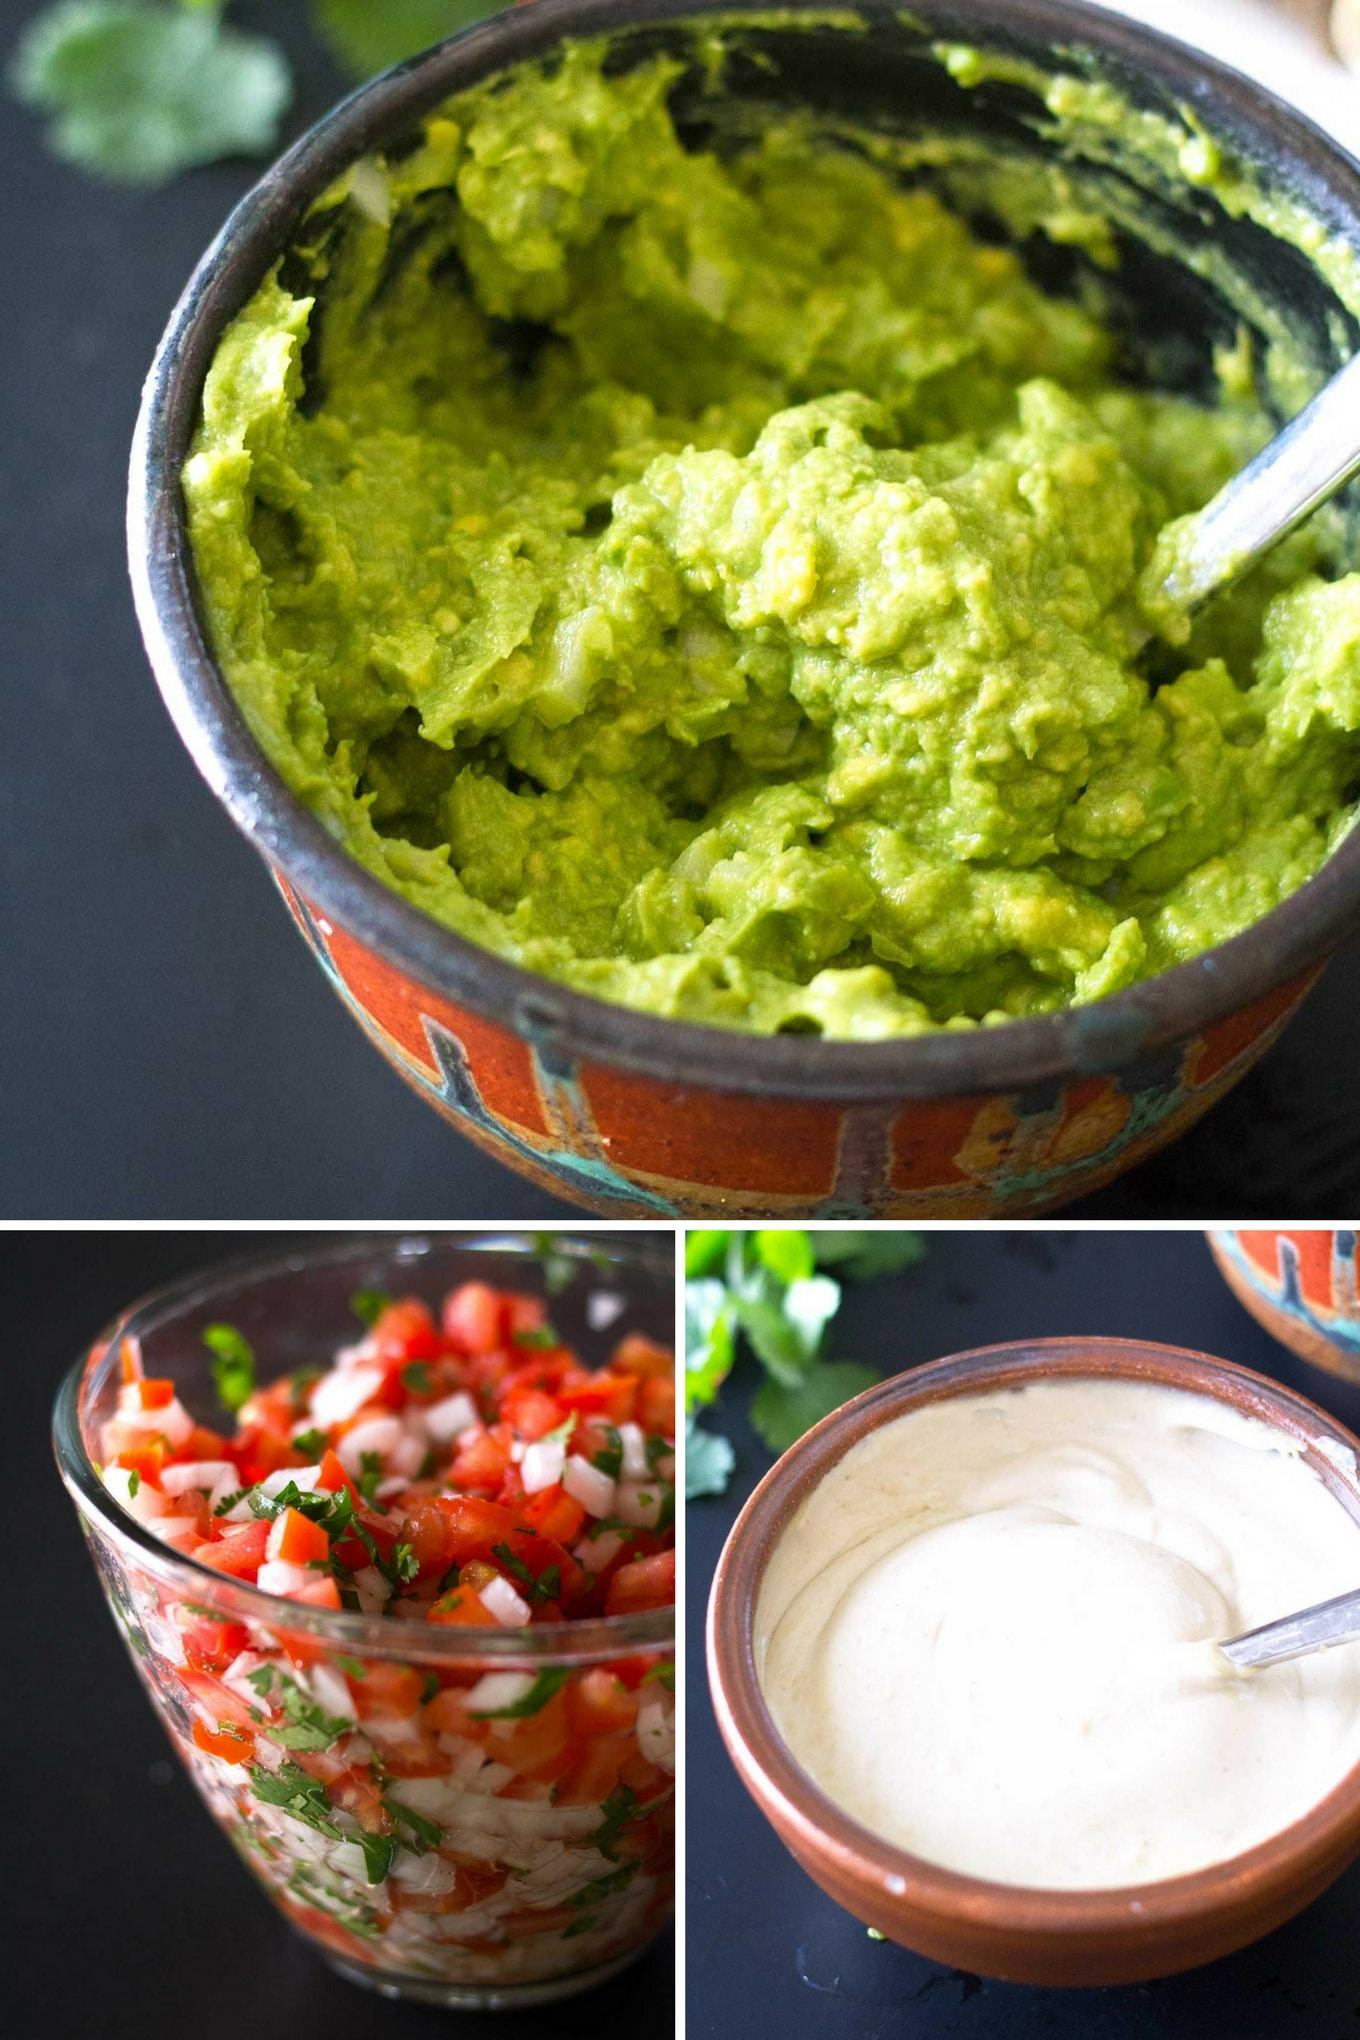 Ultimate Vegan Fajitas | Toppings such as guacamole, pico de gallo, savory cashew cream | https://eatwithinyourmeans.com/